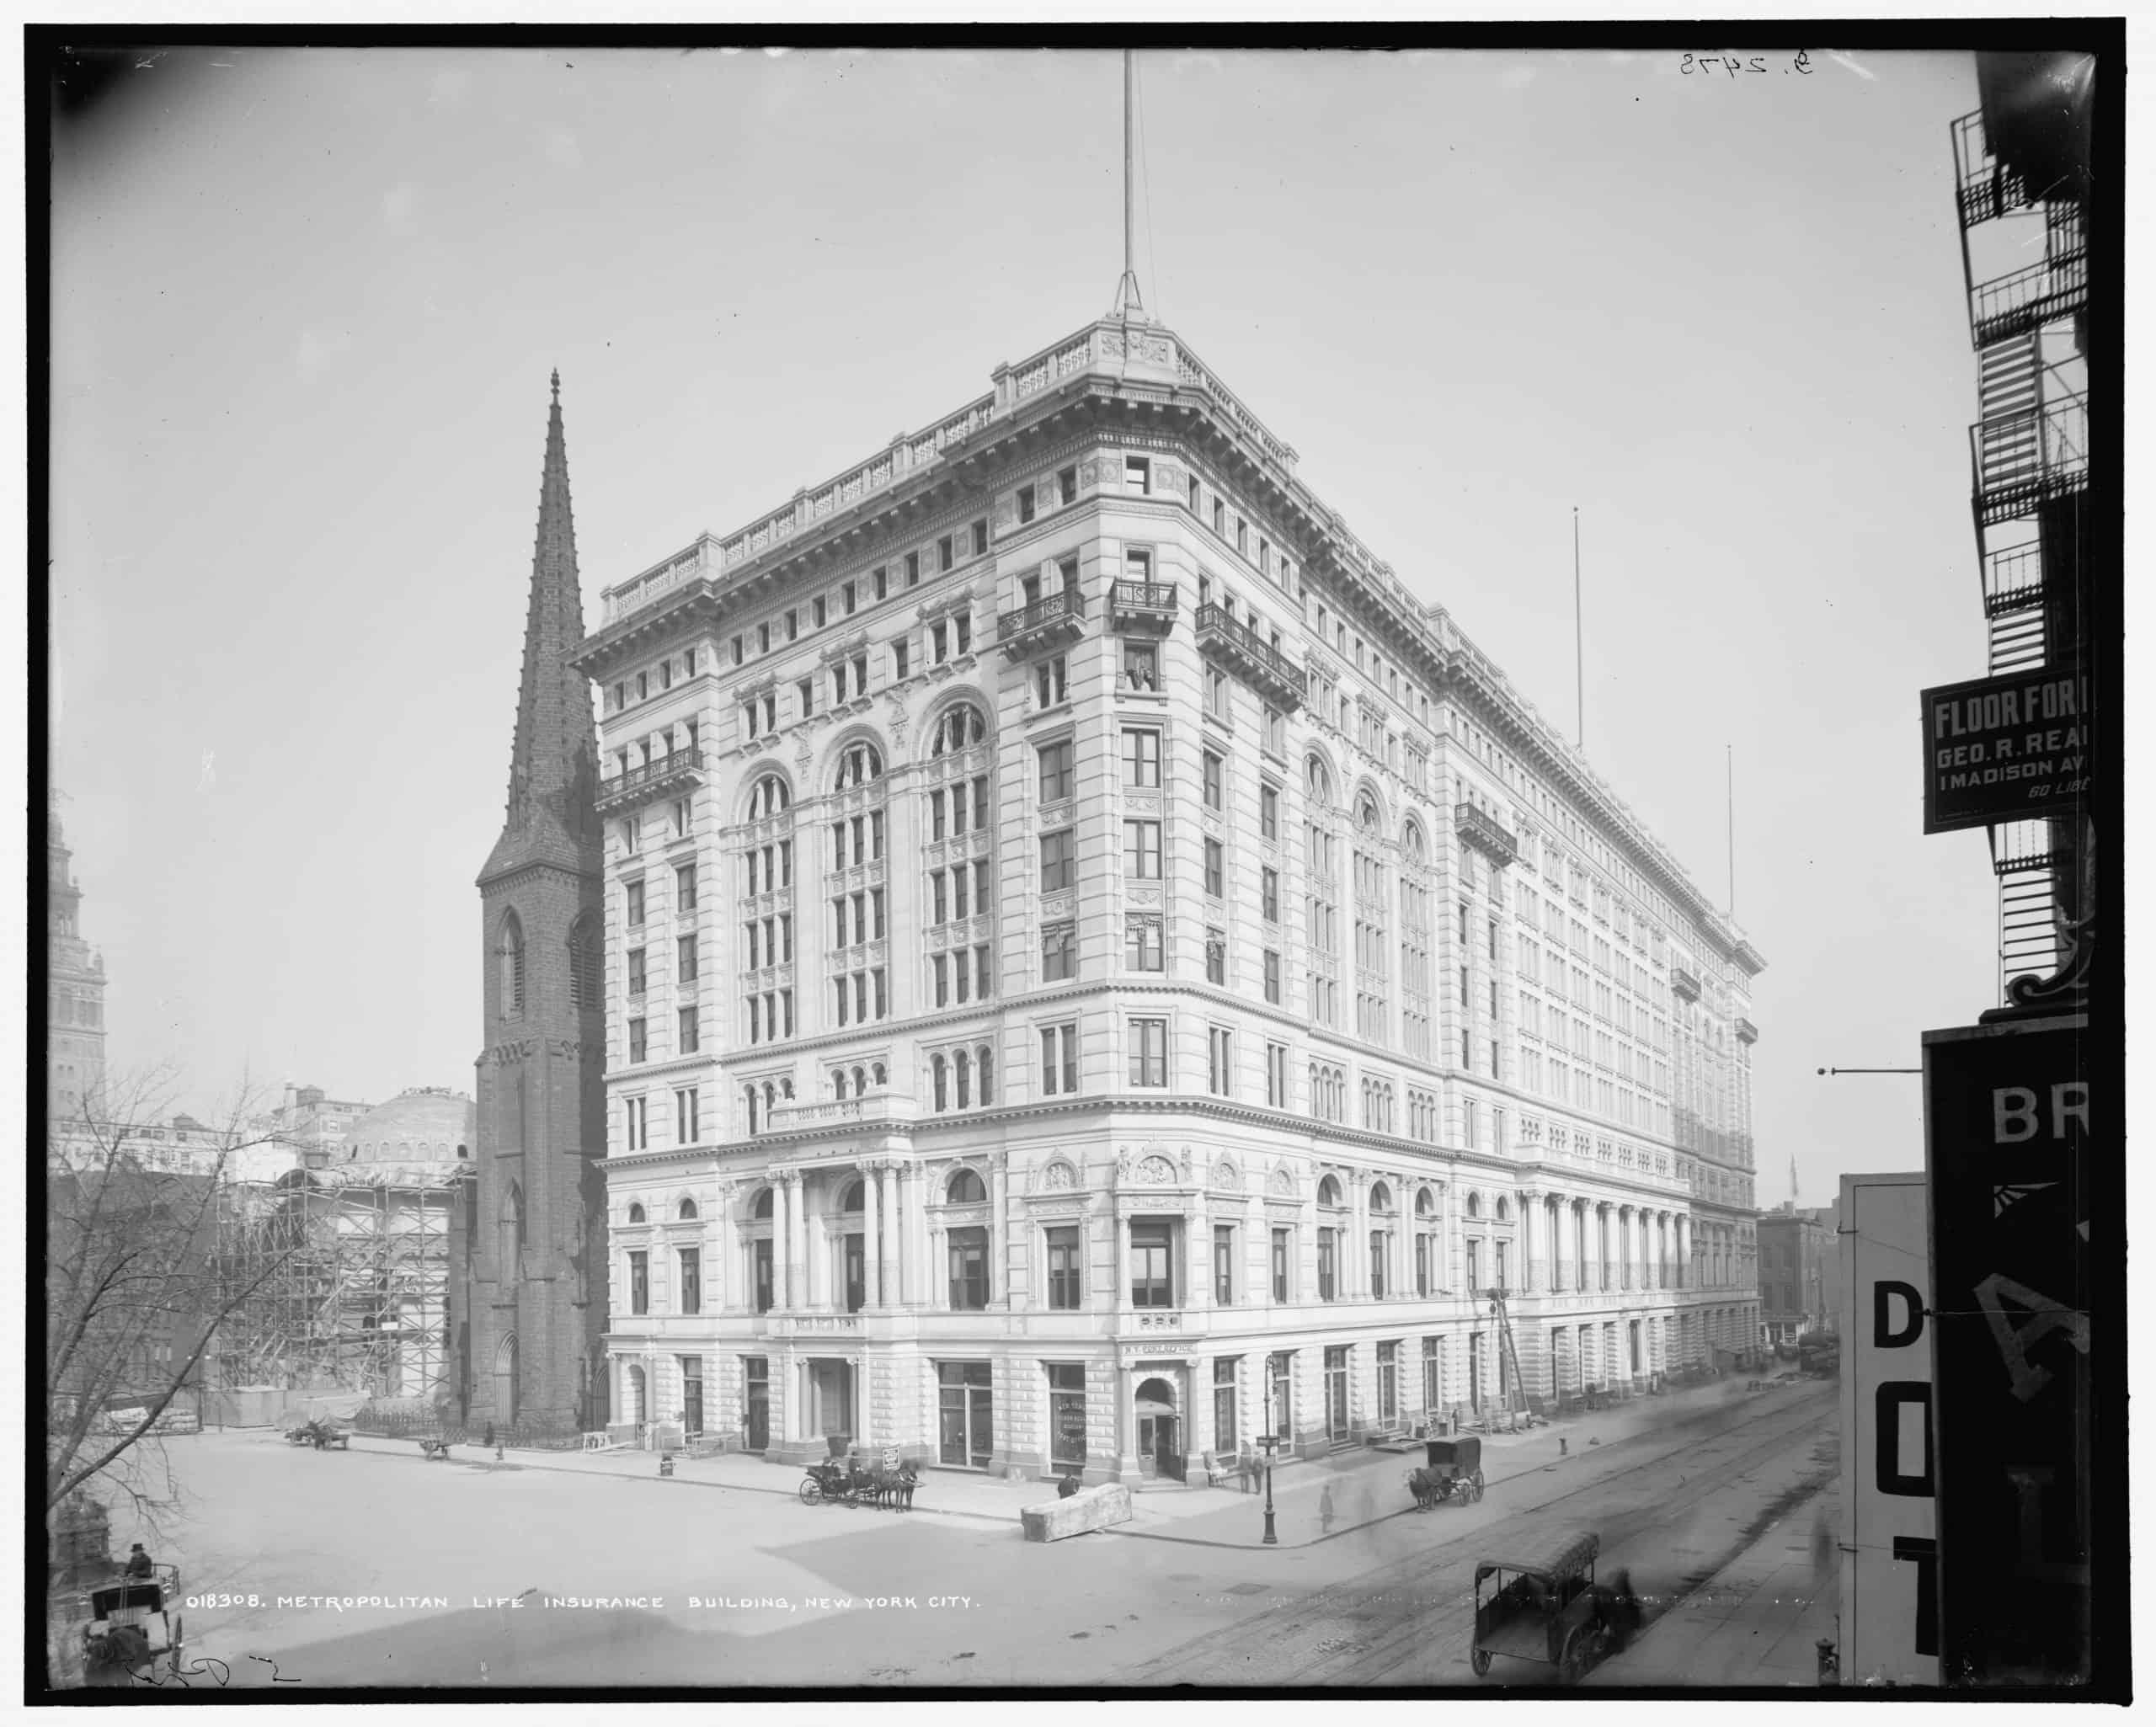 Metropolitan Life Insurance Building, New York City,  Detroit Publishing Co., ca. 1905.